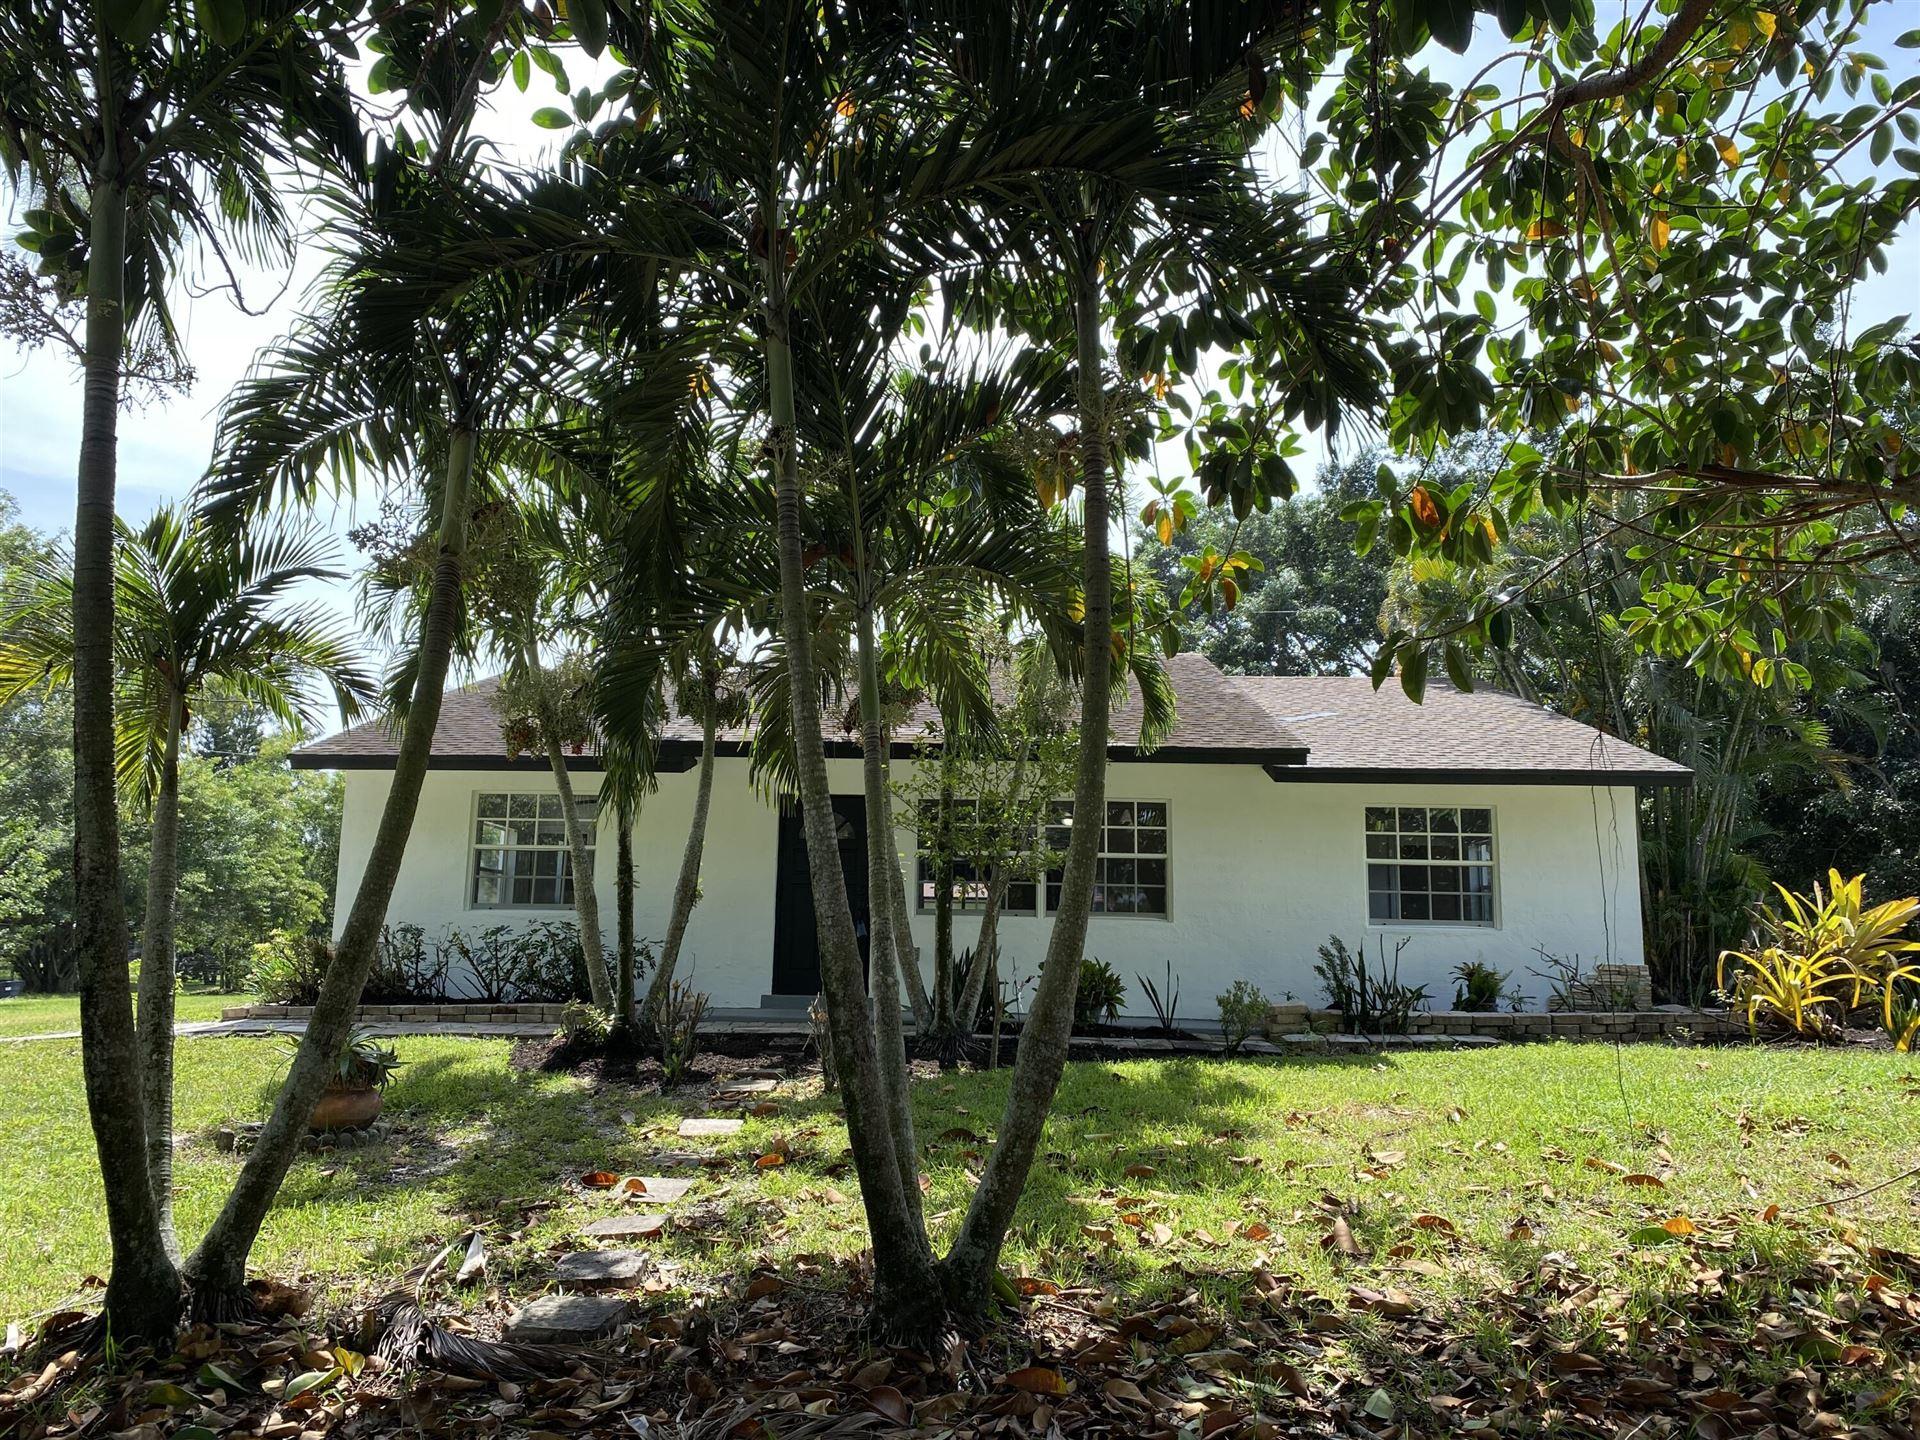 16280 E Aintree Drive, Loxahatchee Groves, FL 33470 - #: RX-10750863